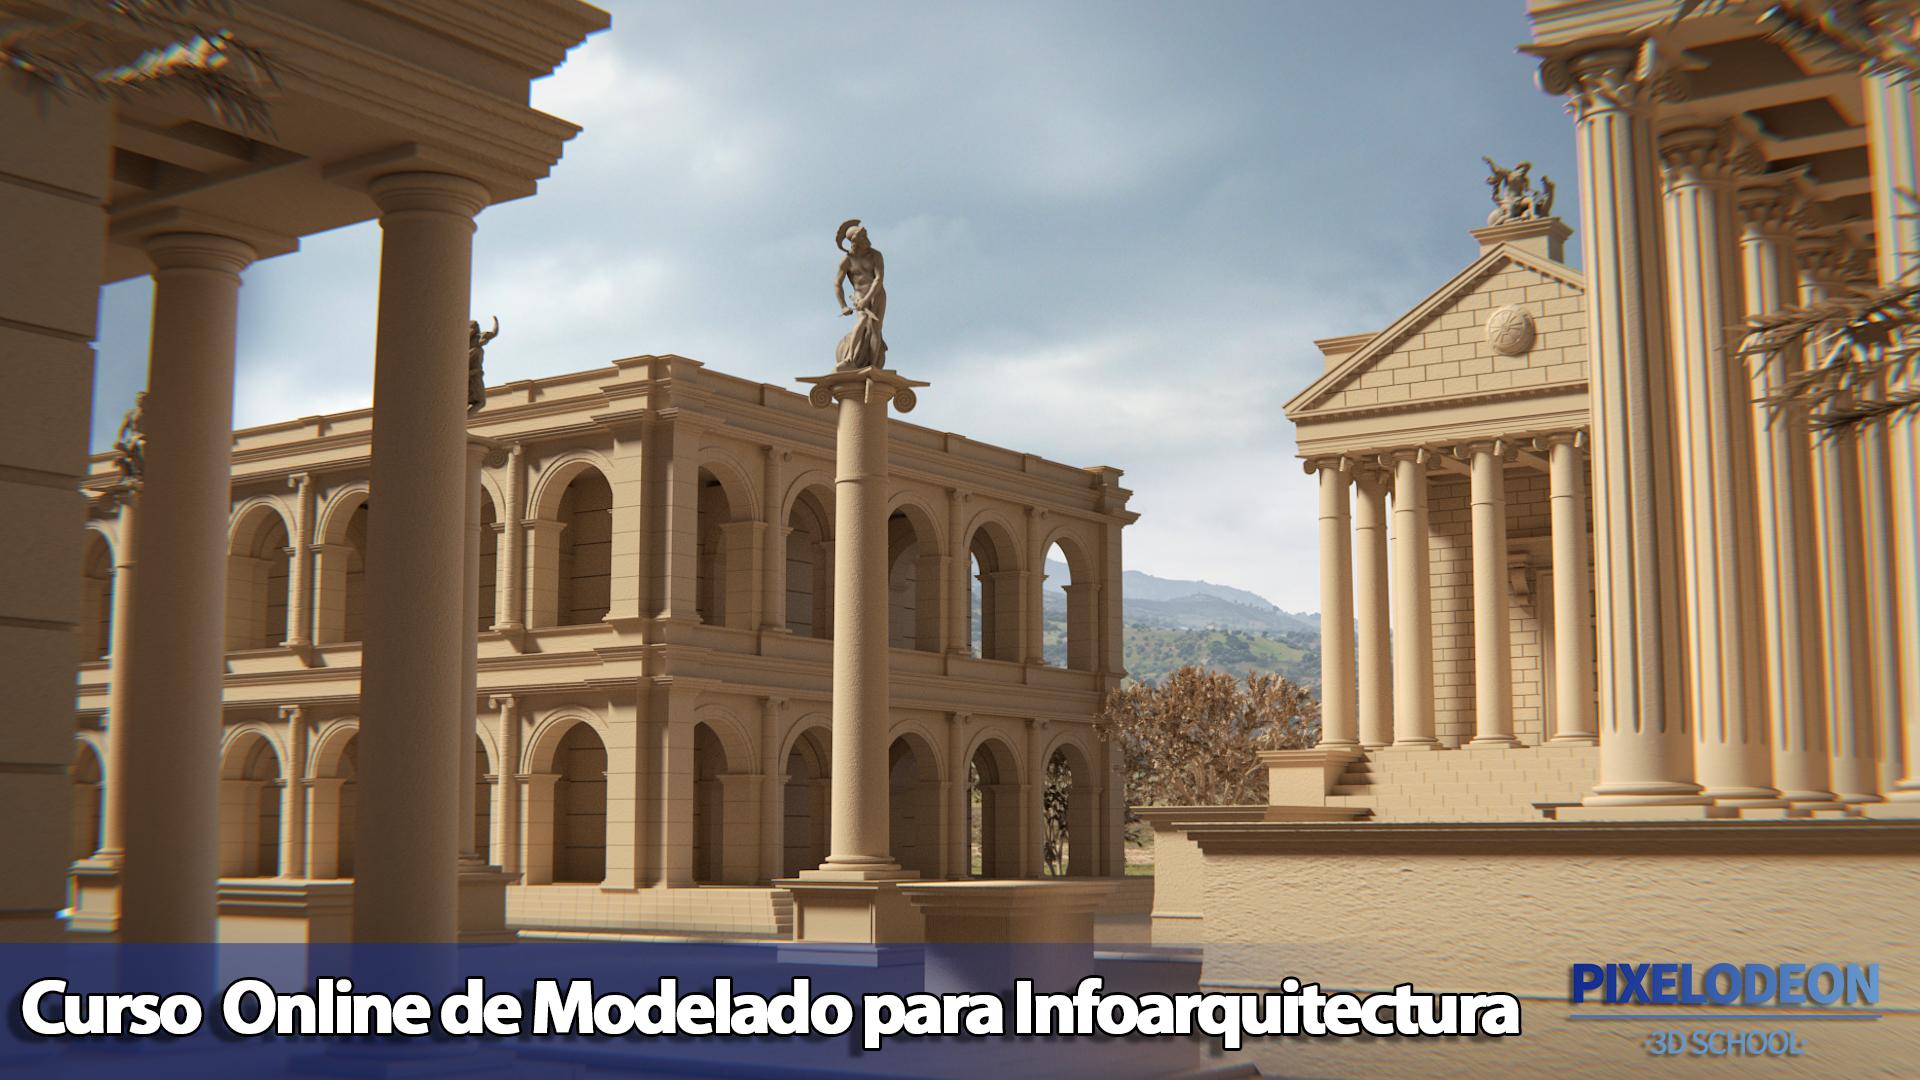 templo_Curso Modelado Infoarquitectura-PIXELODEON3DSchool